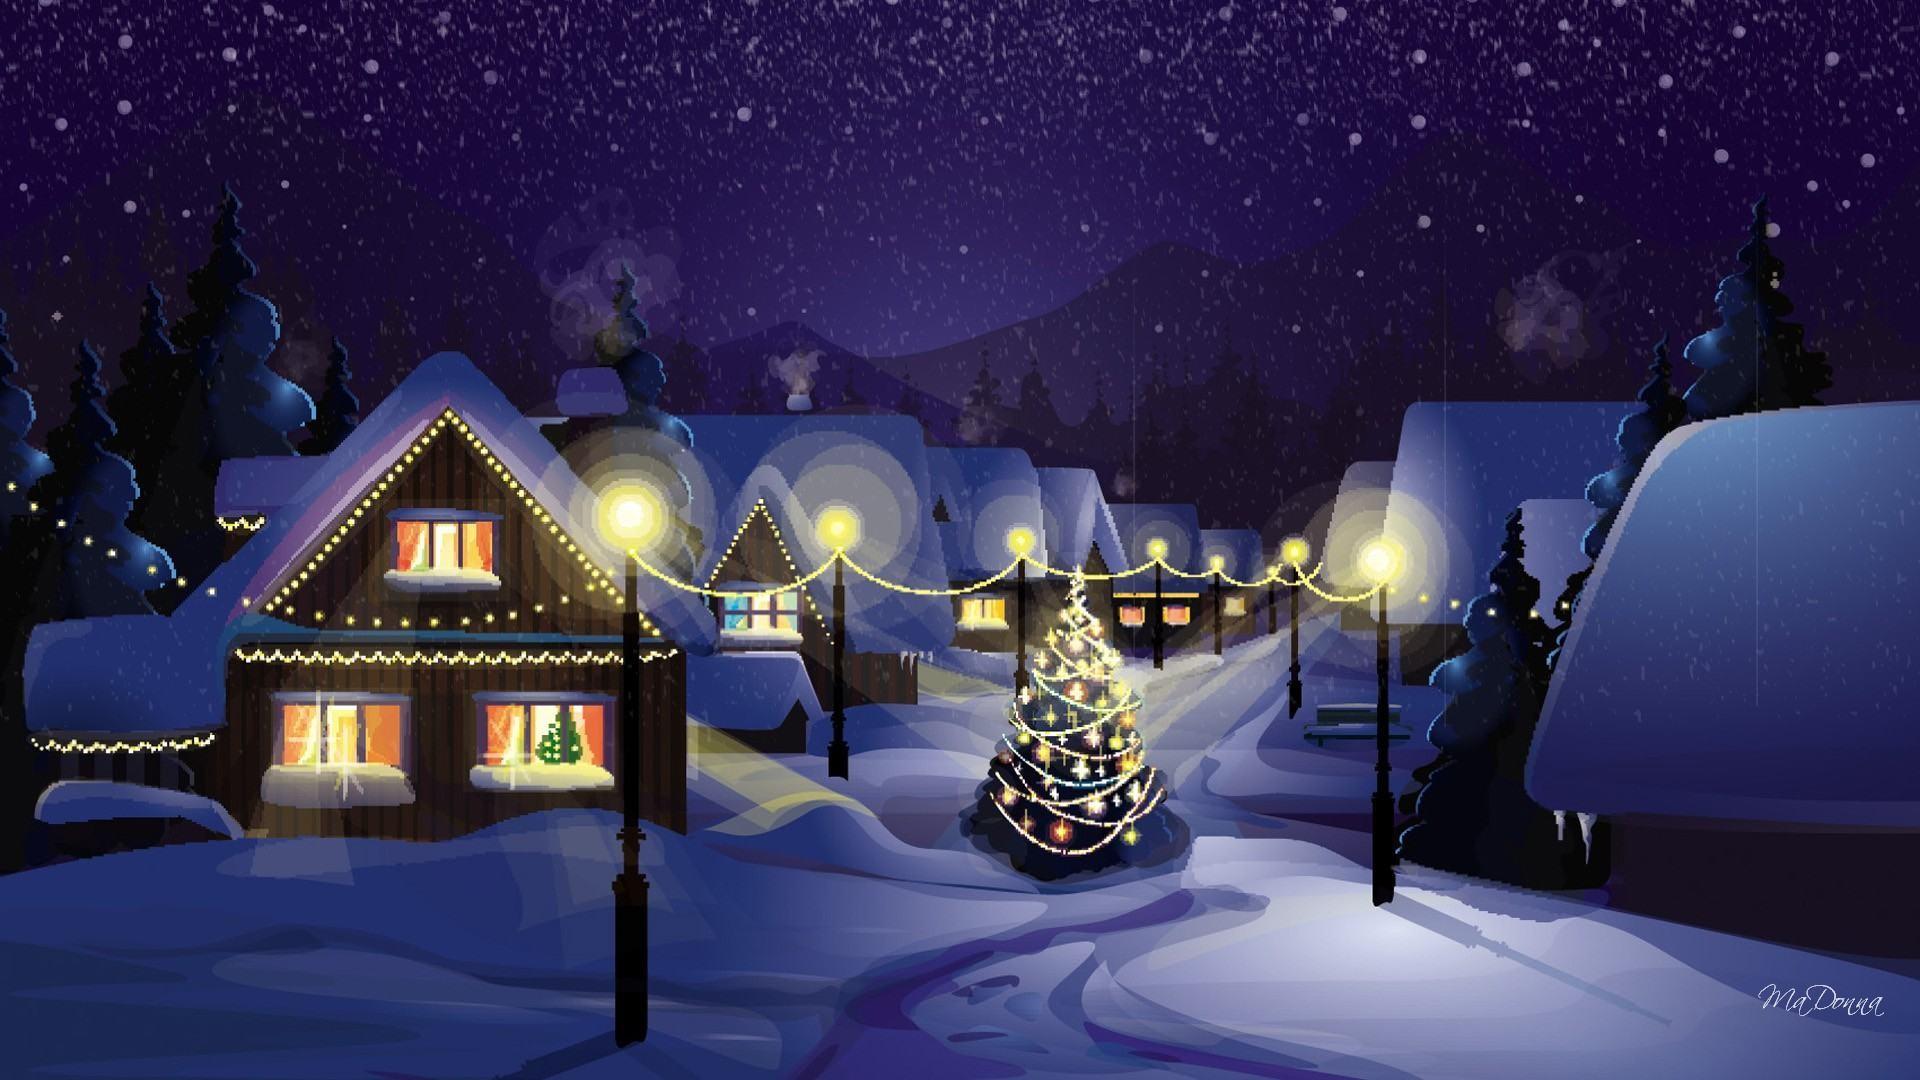 Christmas village wallpaper